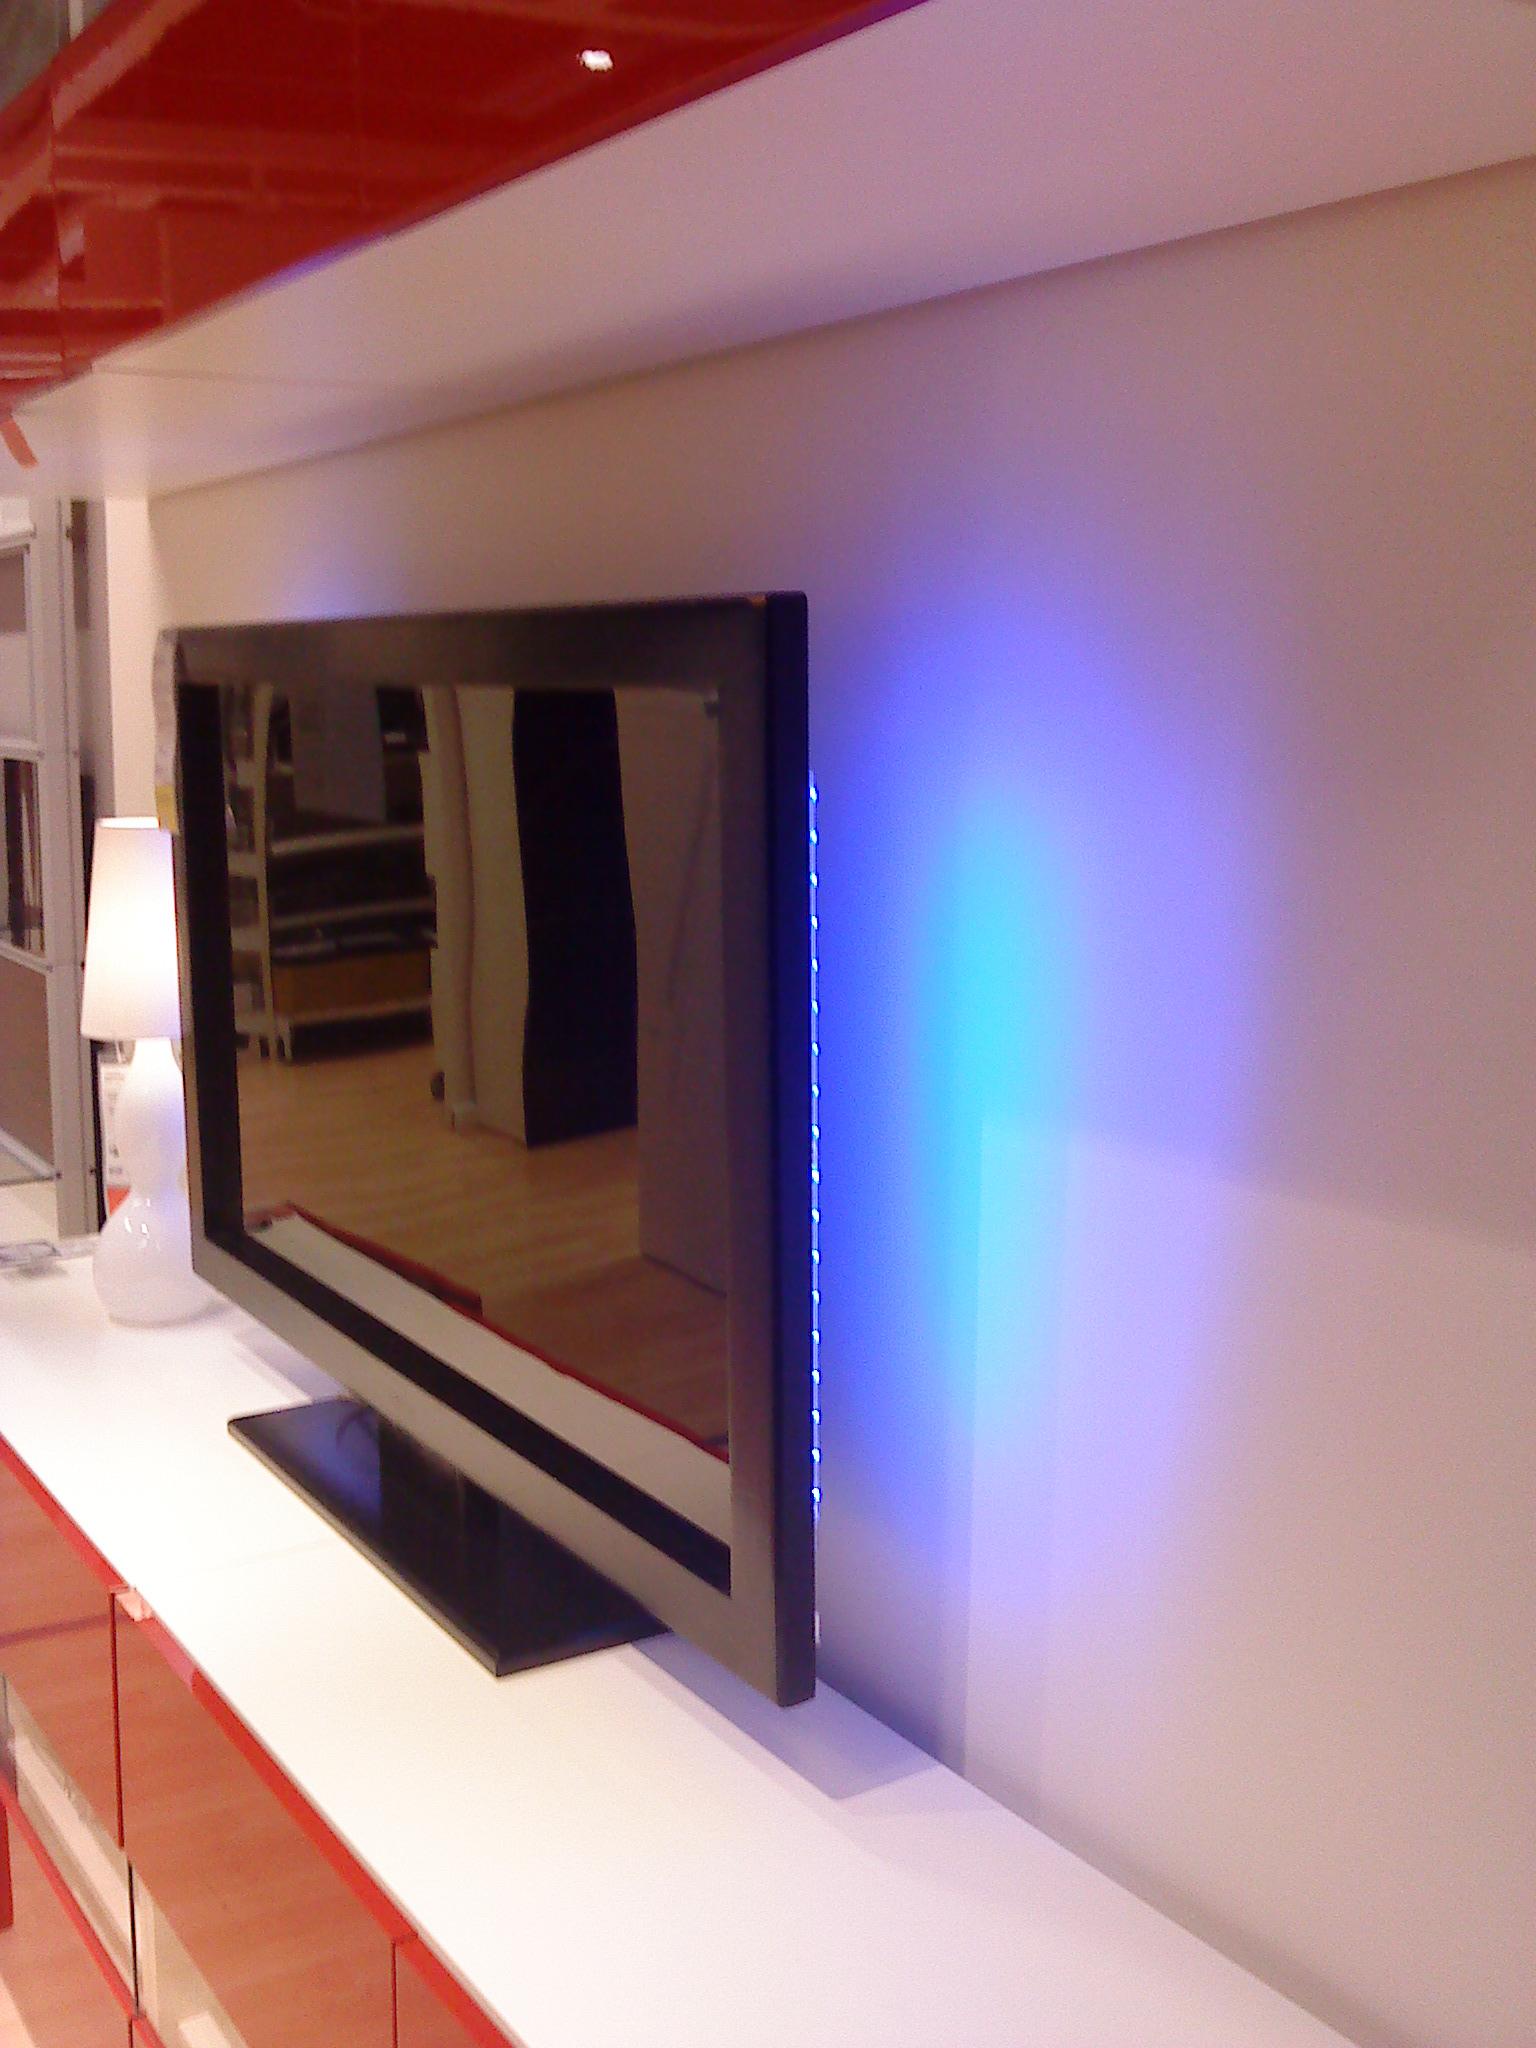 led light ready to go kits ambient tv background led light kits volka lighting pty ltd. Black Bedroom Furniture Sets. Home Design Ideas